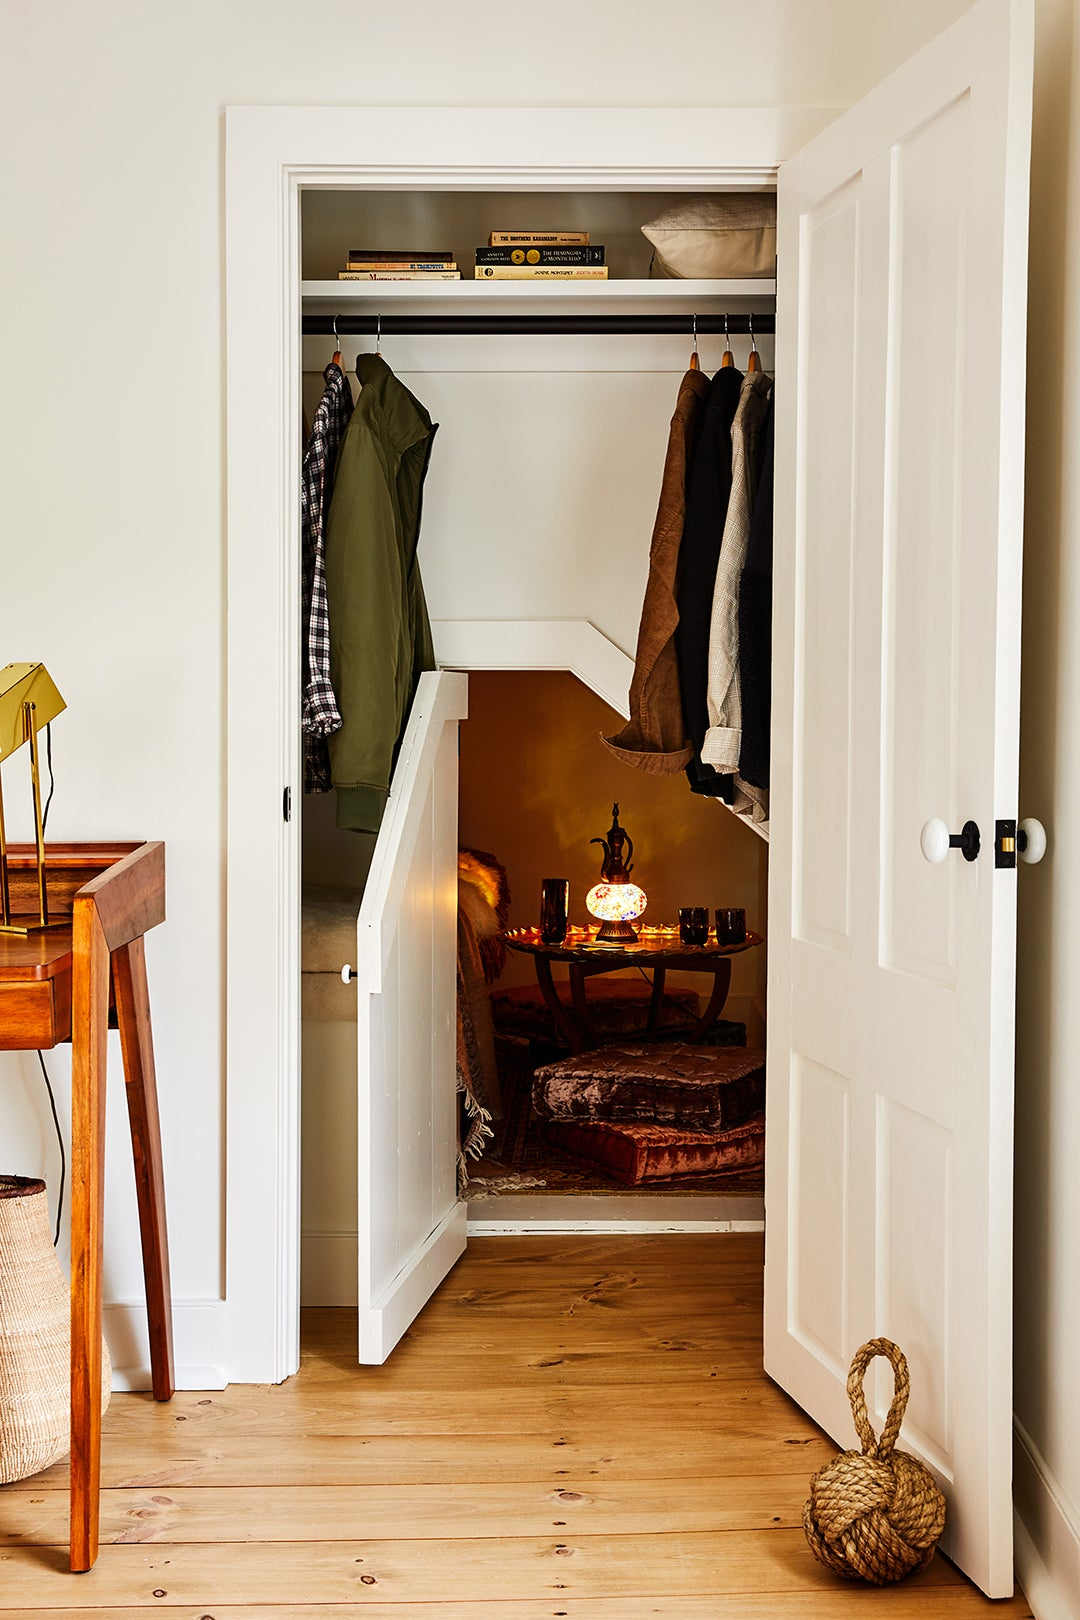 Narnia-esque nook in closet